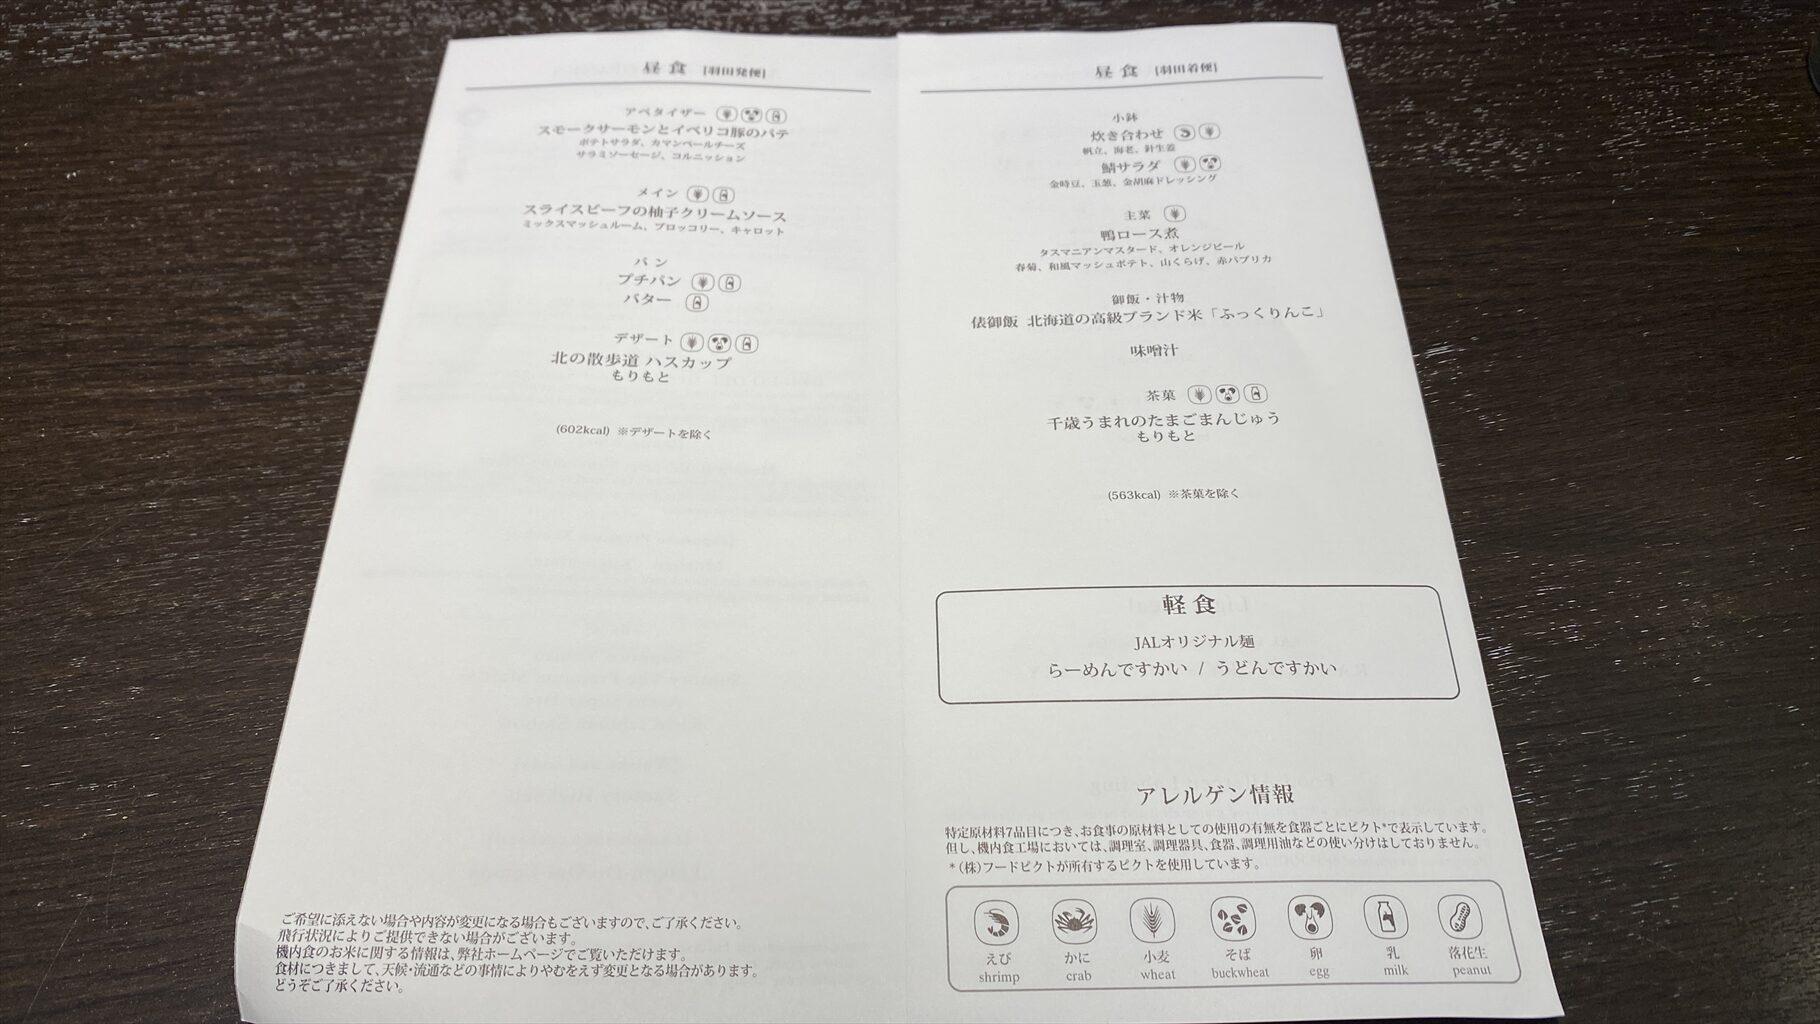 JAL JL904 沖縄(那覇)~羽田 ファーストクラス機内食 21JAN21